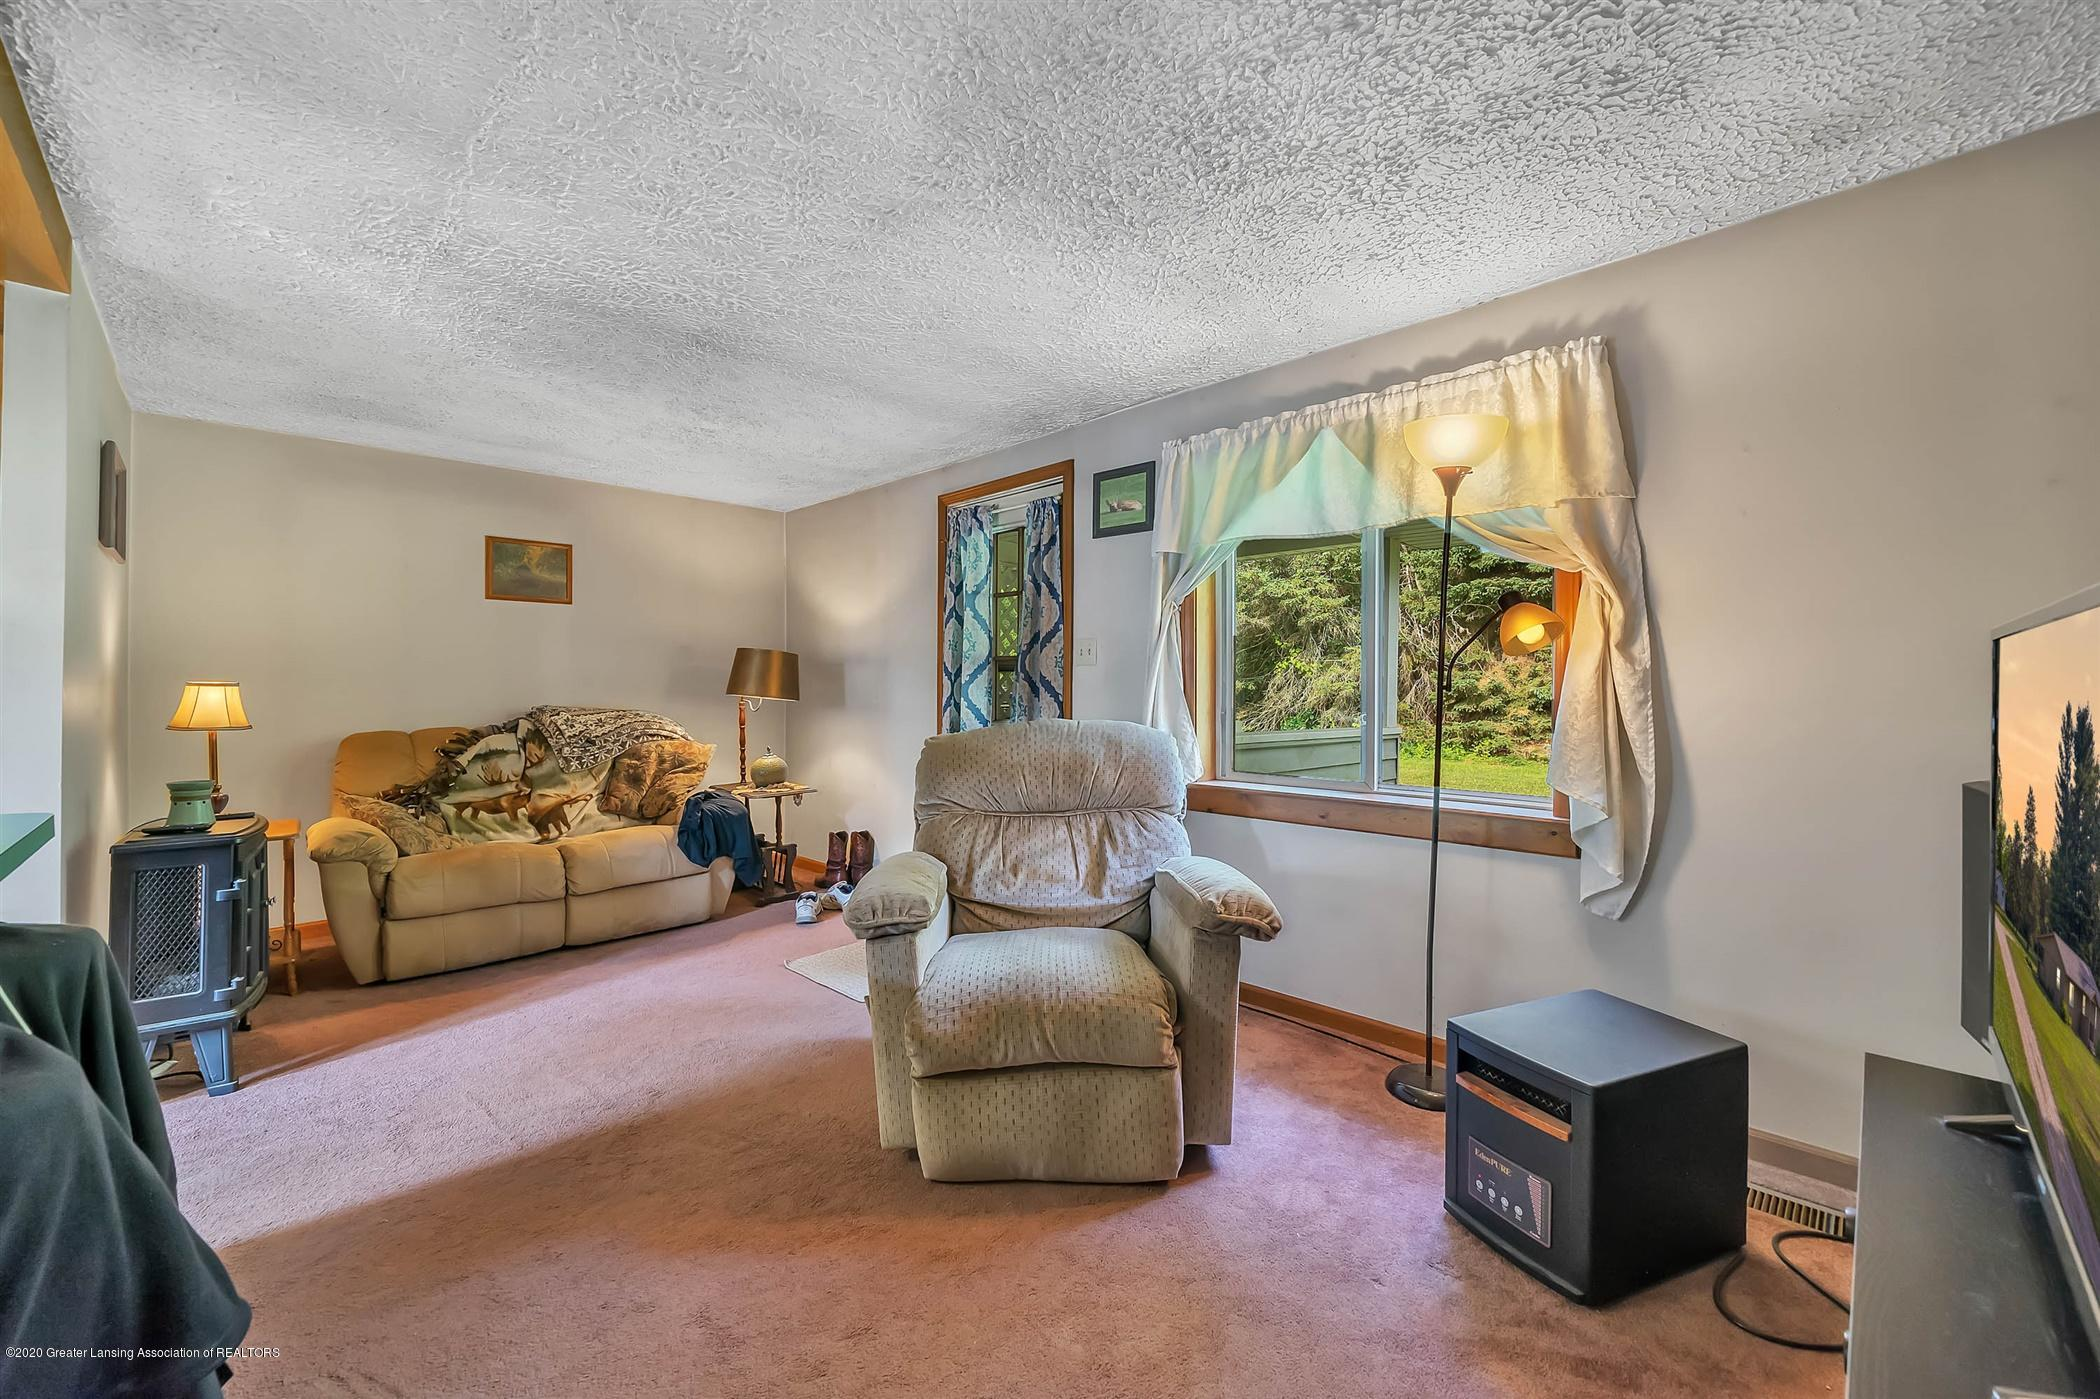 6750 W Lovejoy Rd - (33) 6758 Lovejoy Living Room - 33